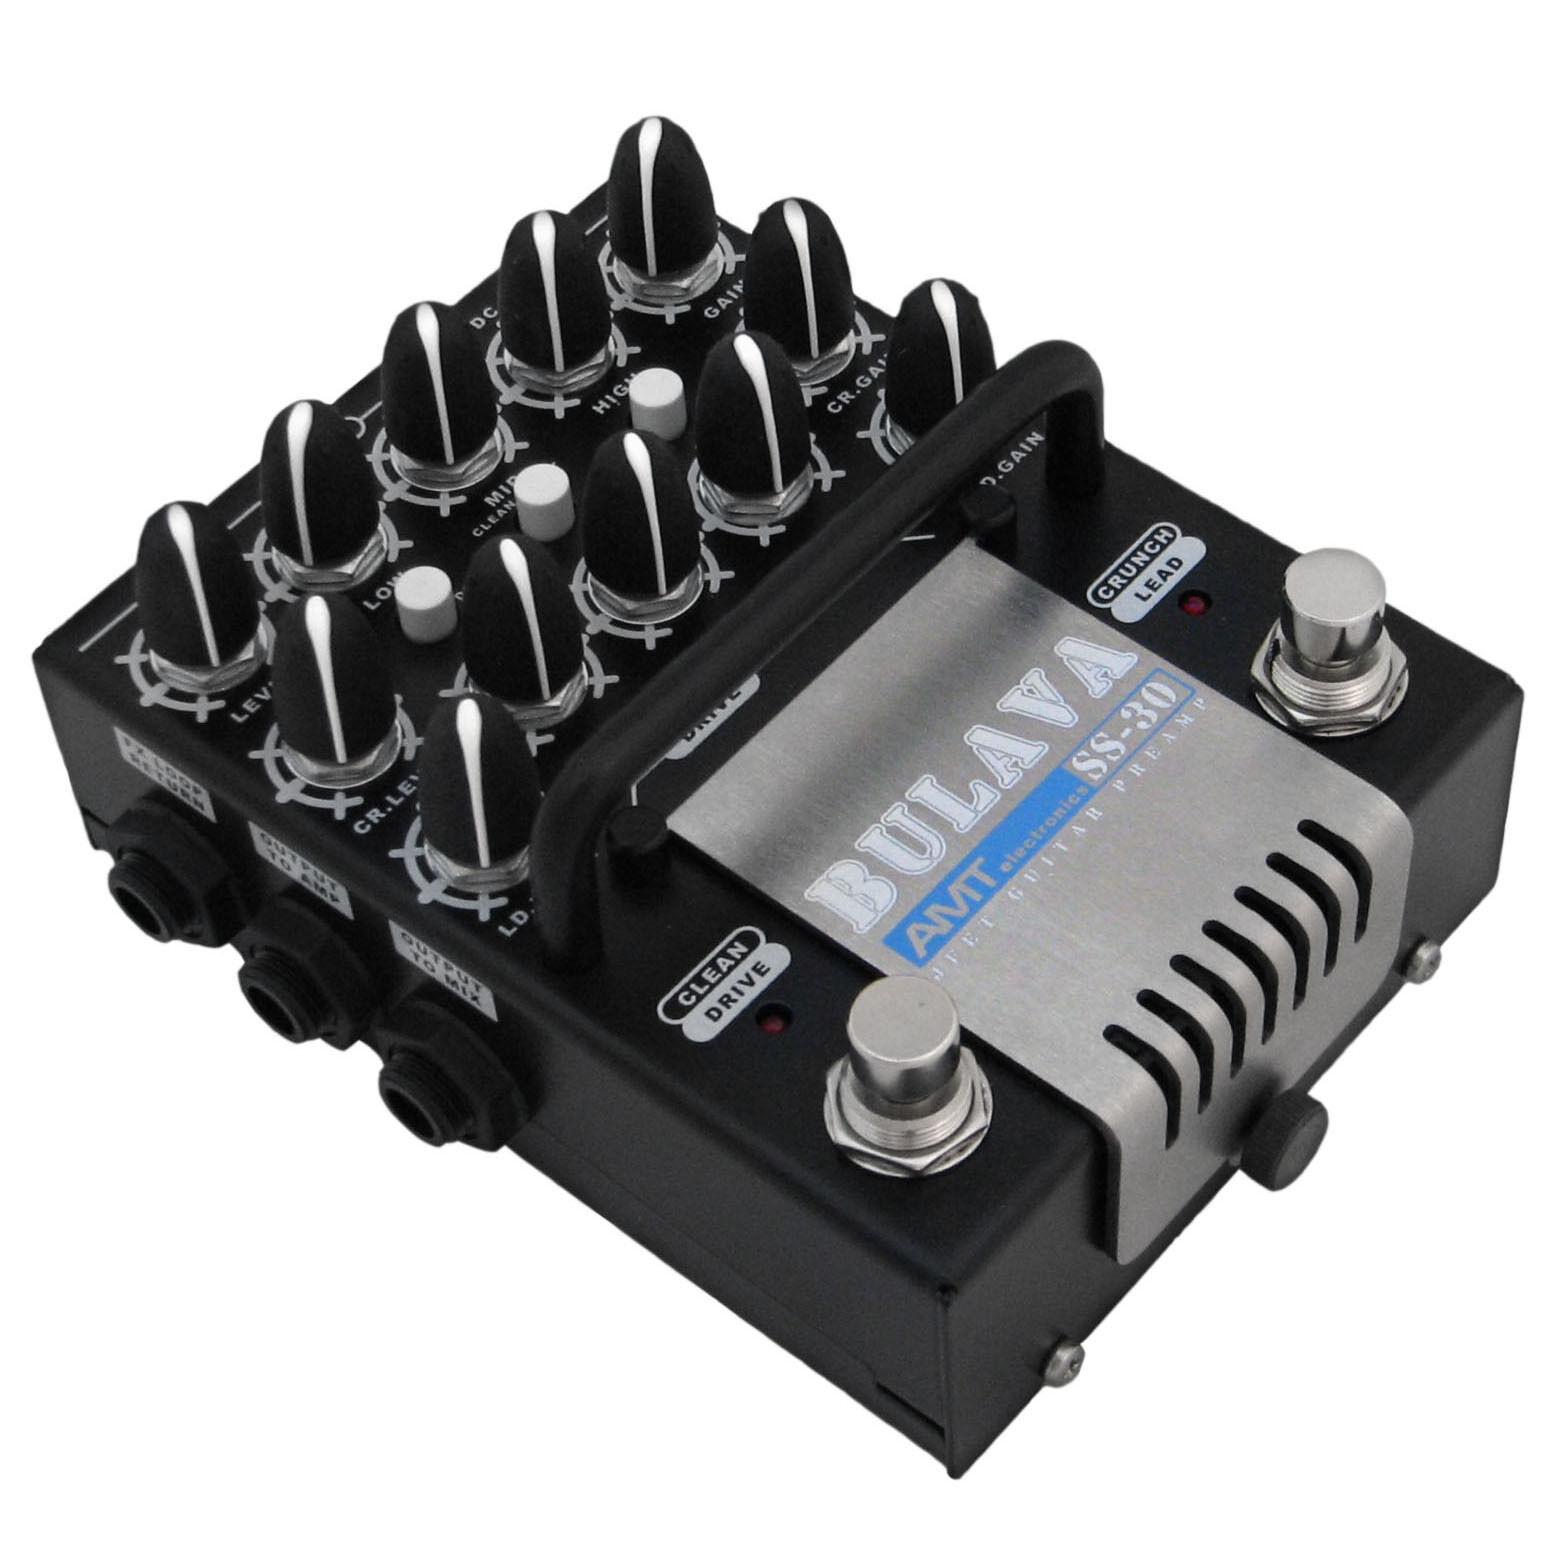 AMT Electronics SS-30 Bulava 3-channel JFET